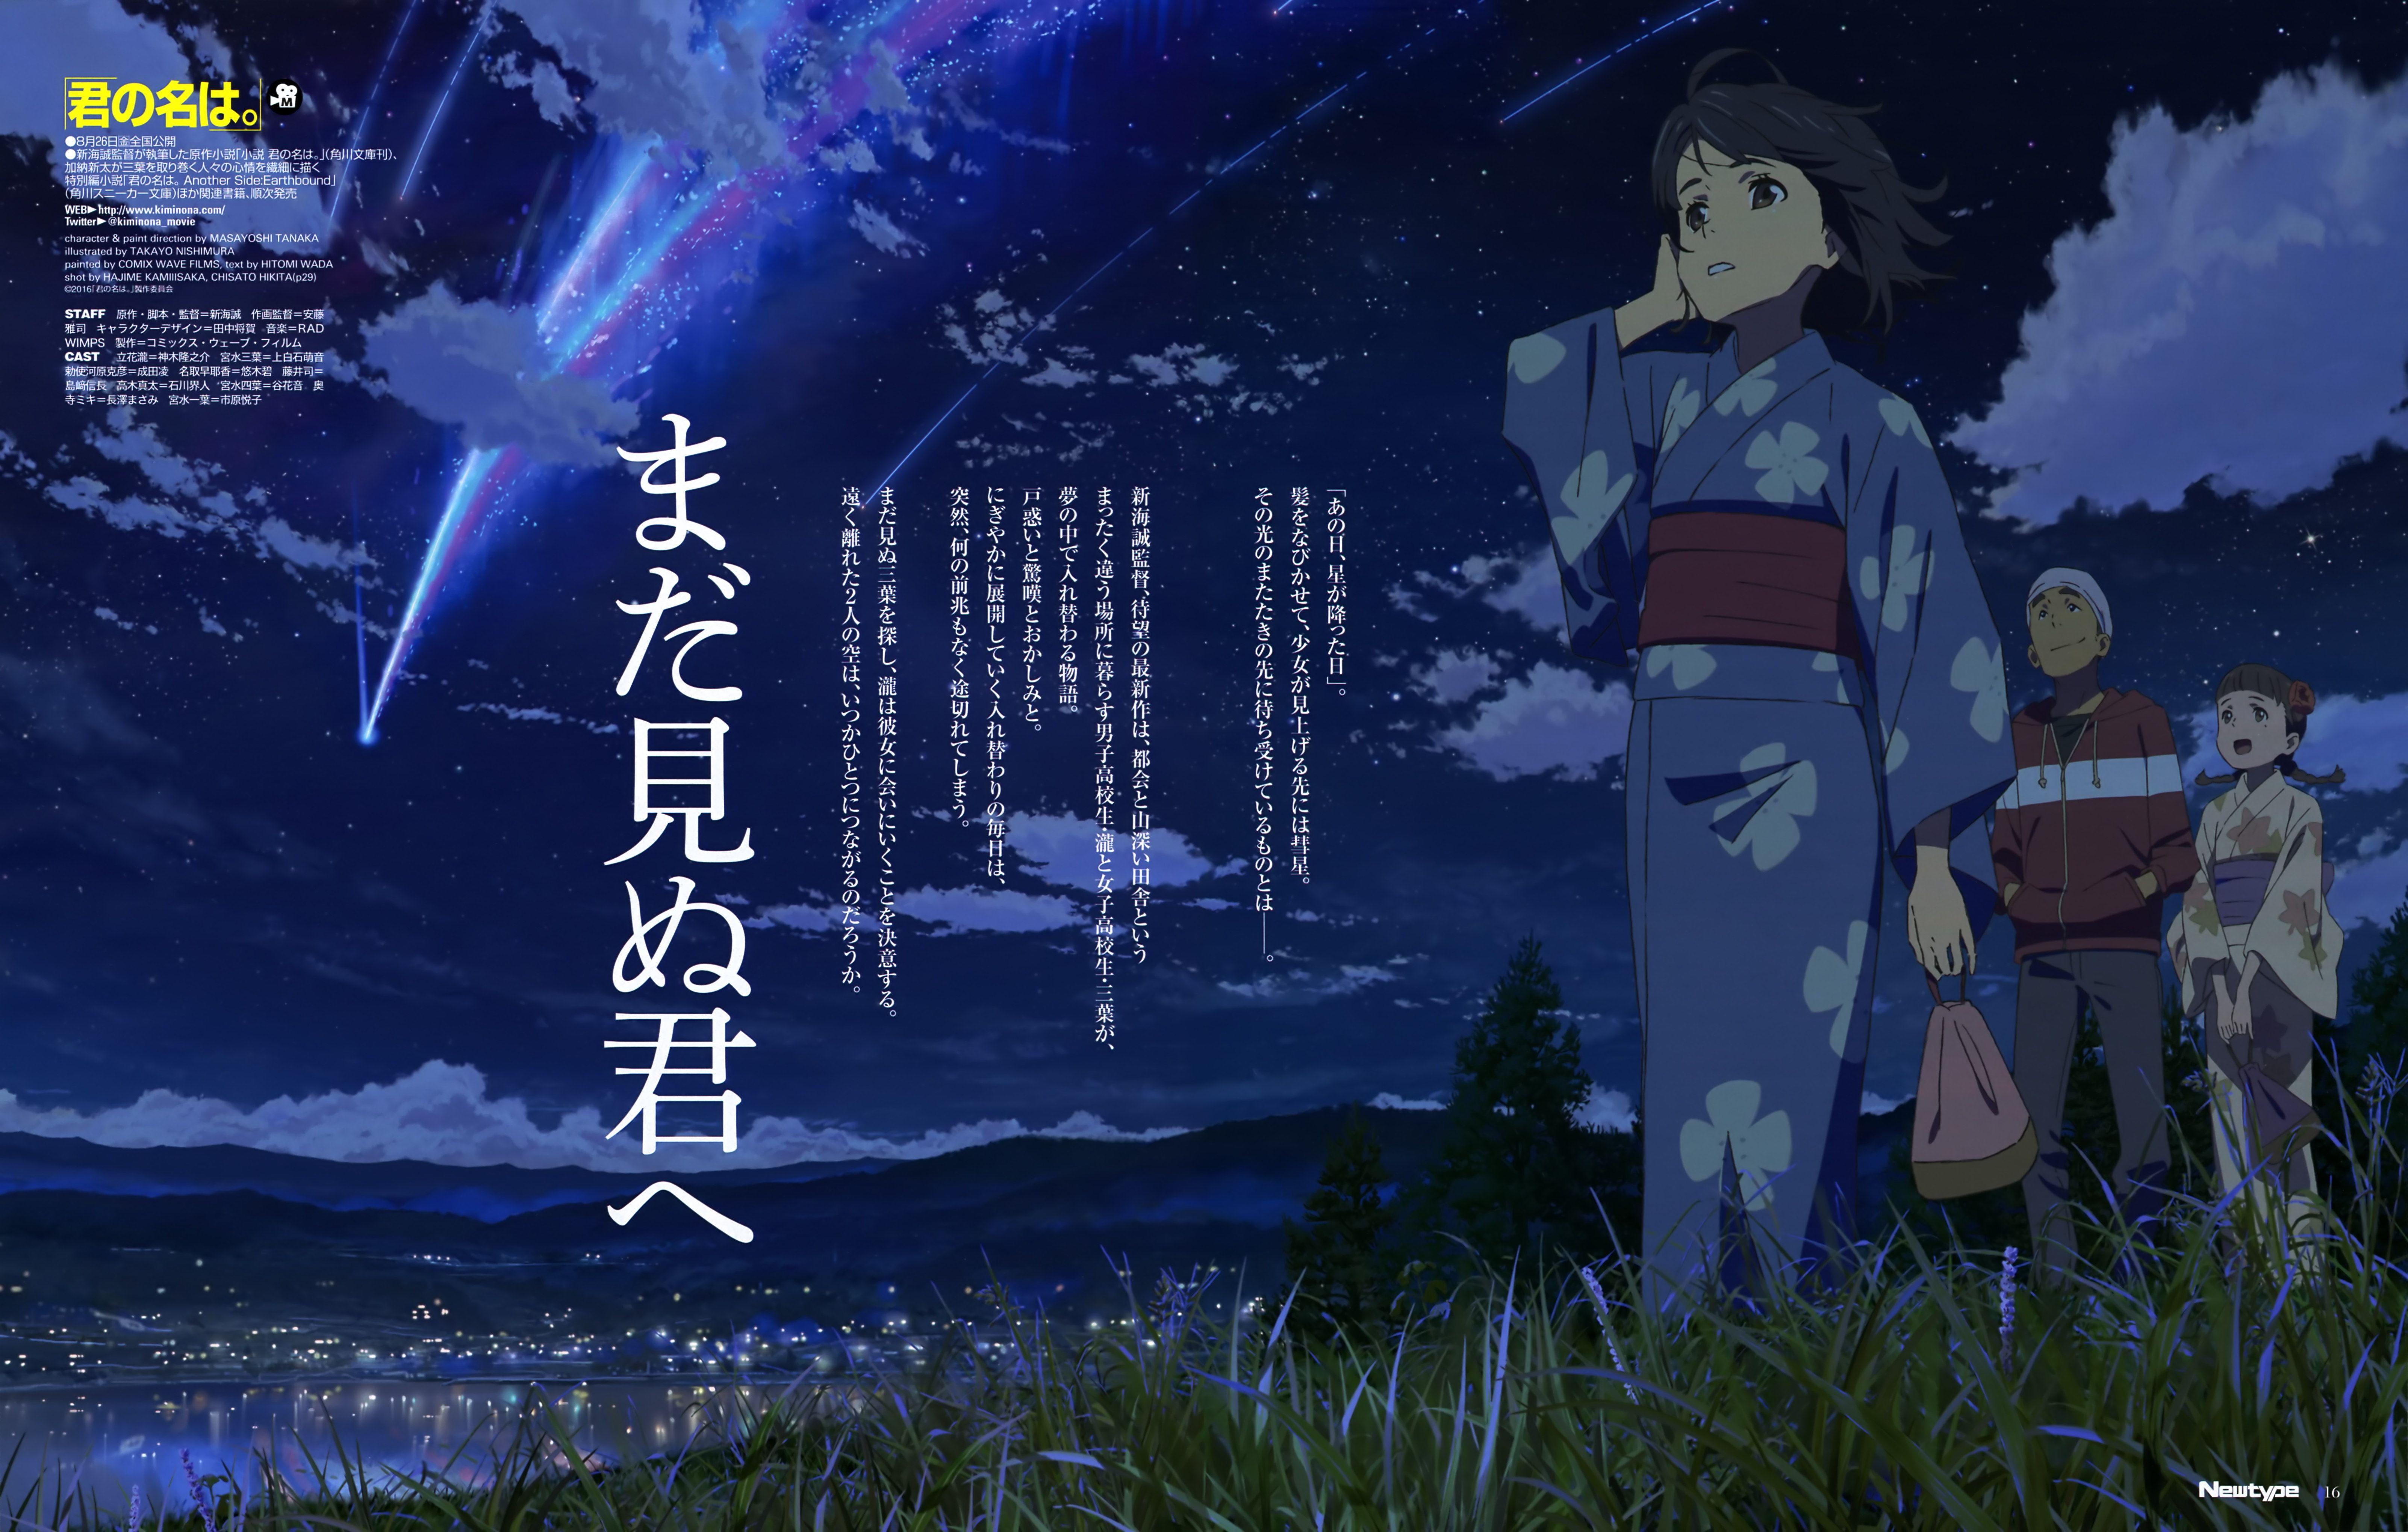 /Kimi no Na wa./#2029459 | Fullsize Image (6407x4077) - Zerochan